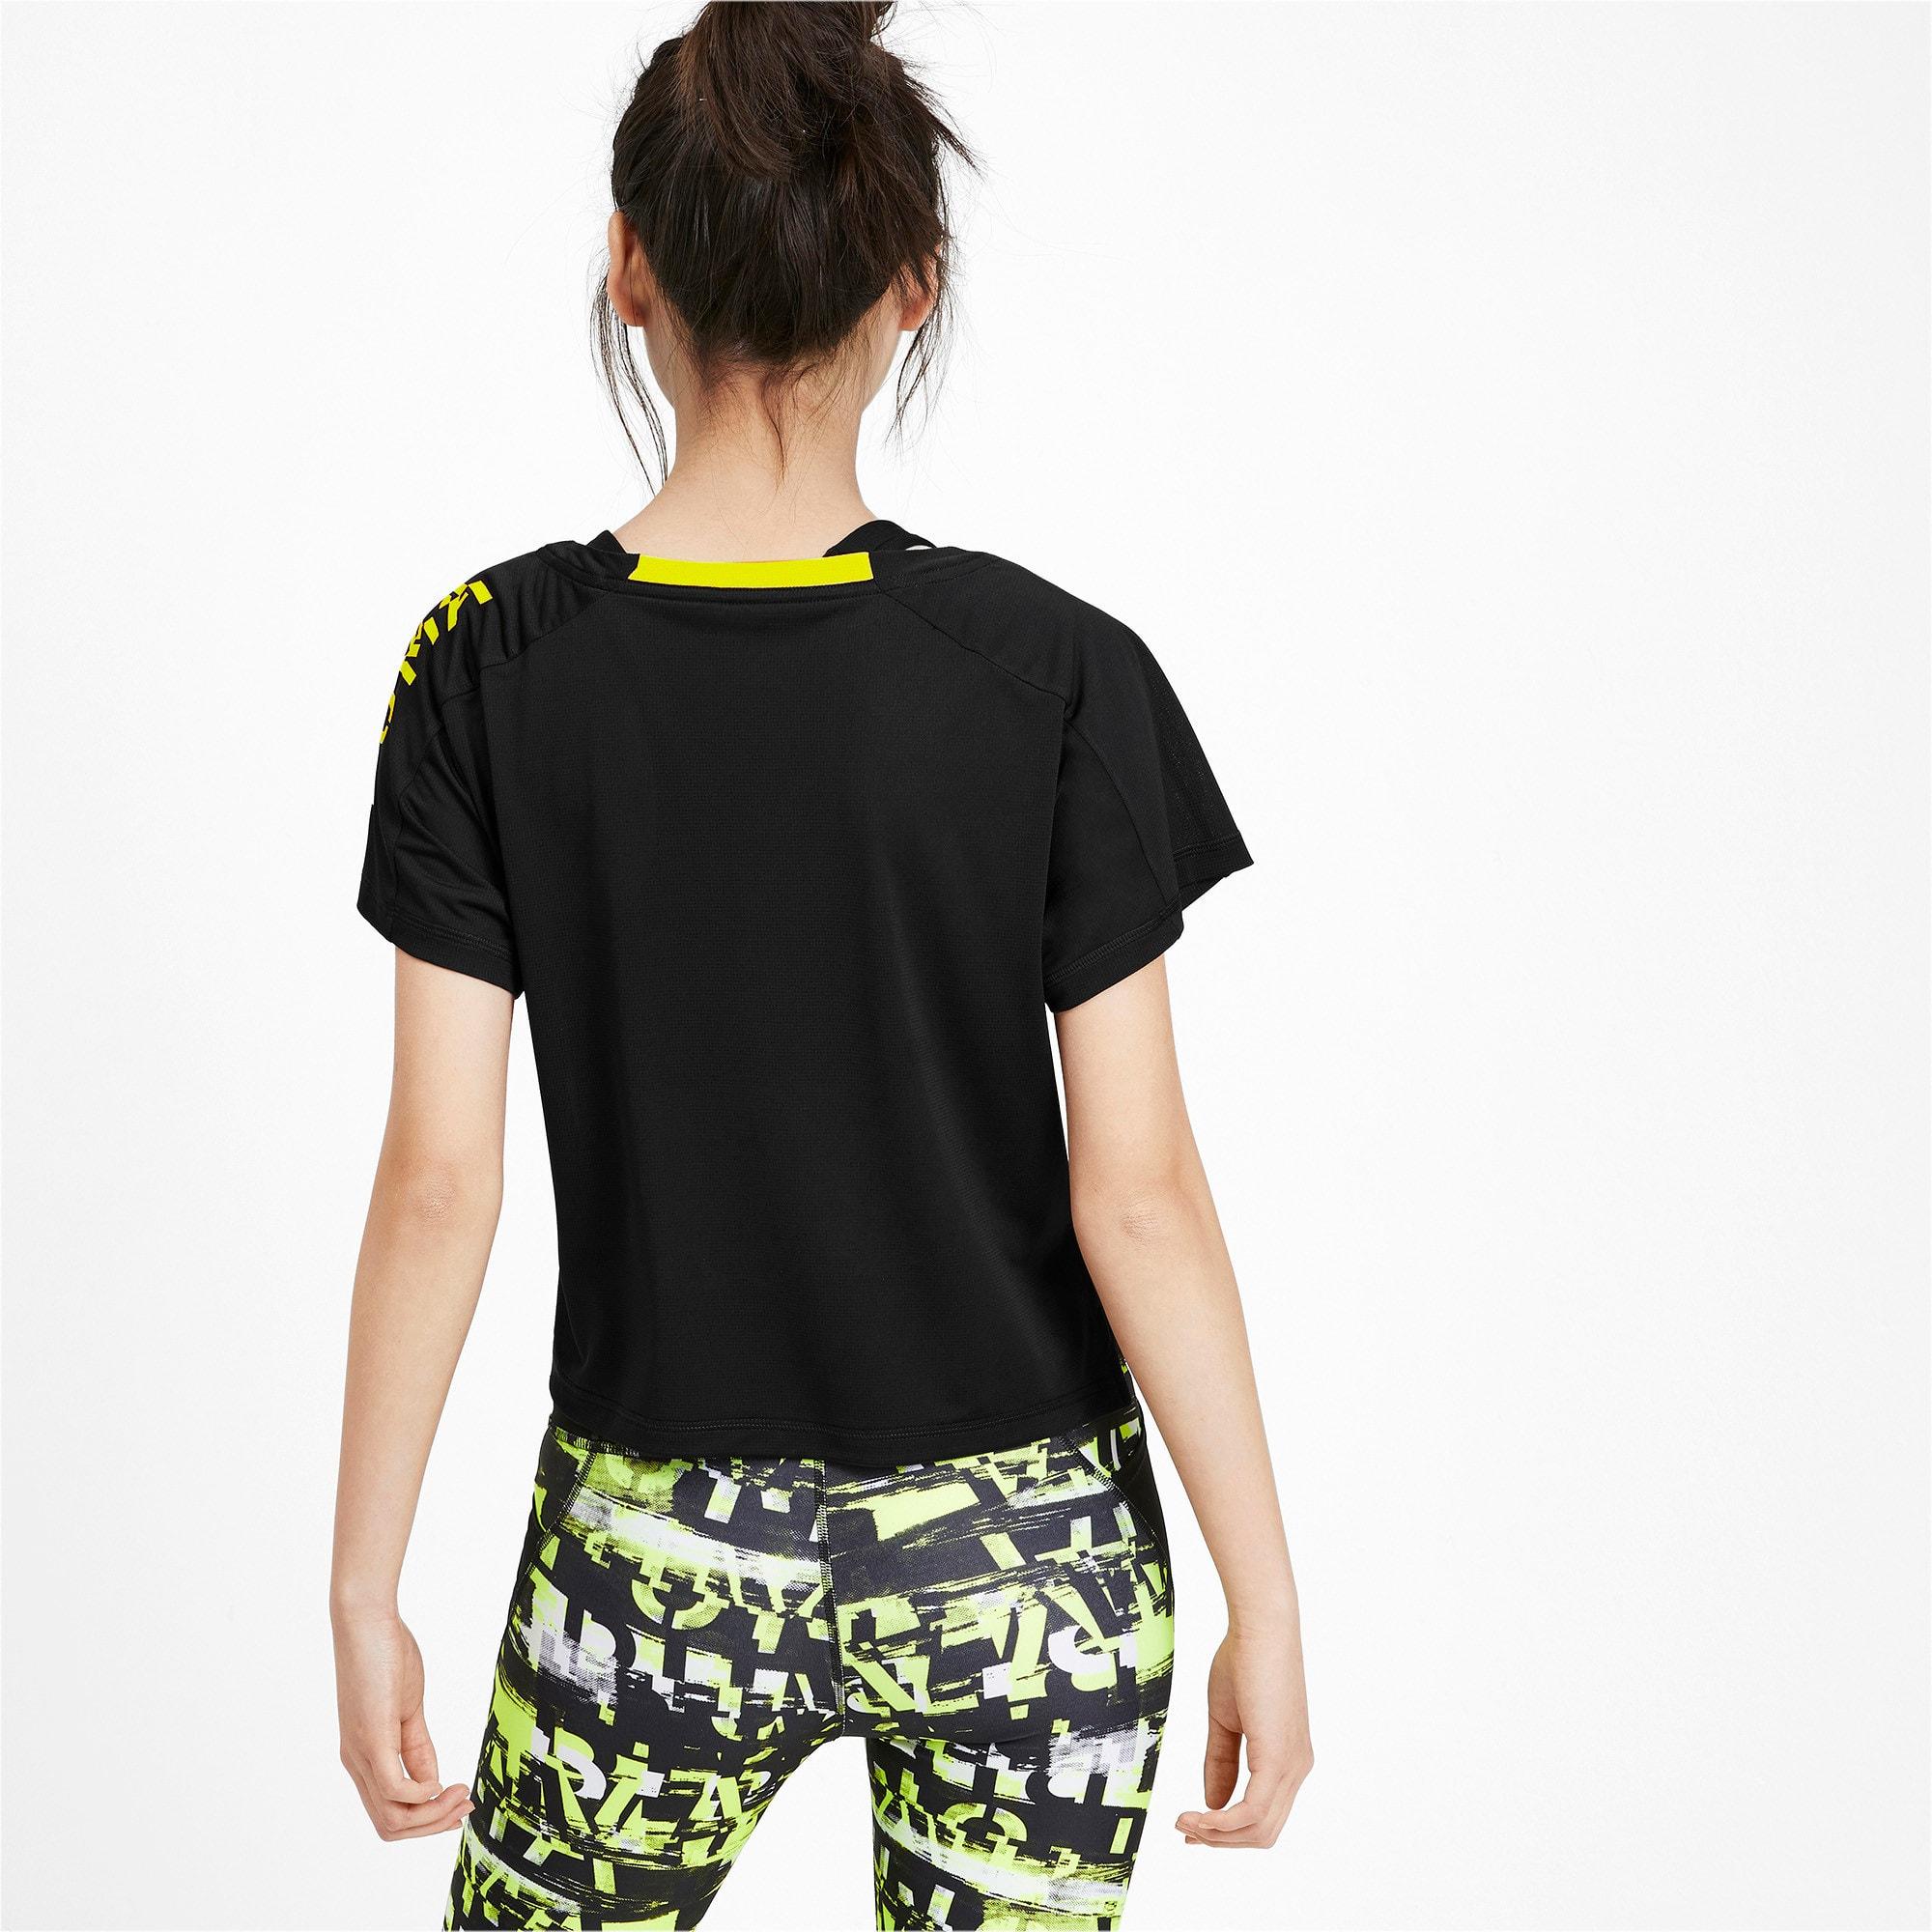 Thumbnail 2 of Cropped Short Sleeve Women's Training Tee, Puma Black-Yellow Alert, medium-IND